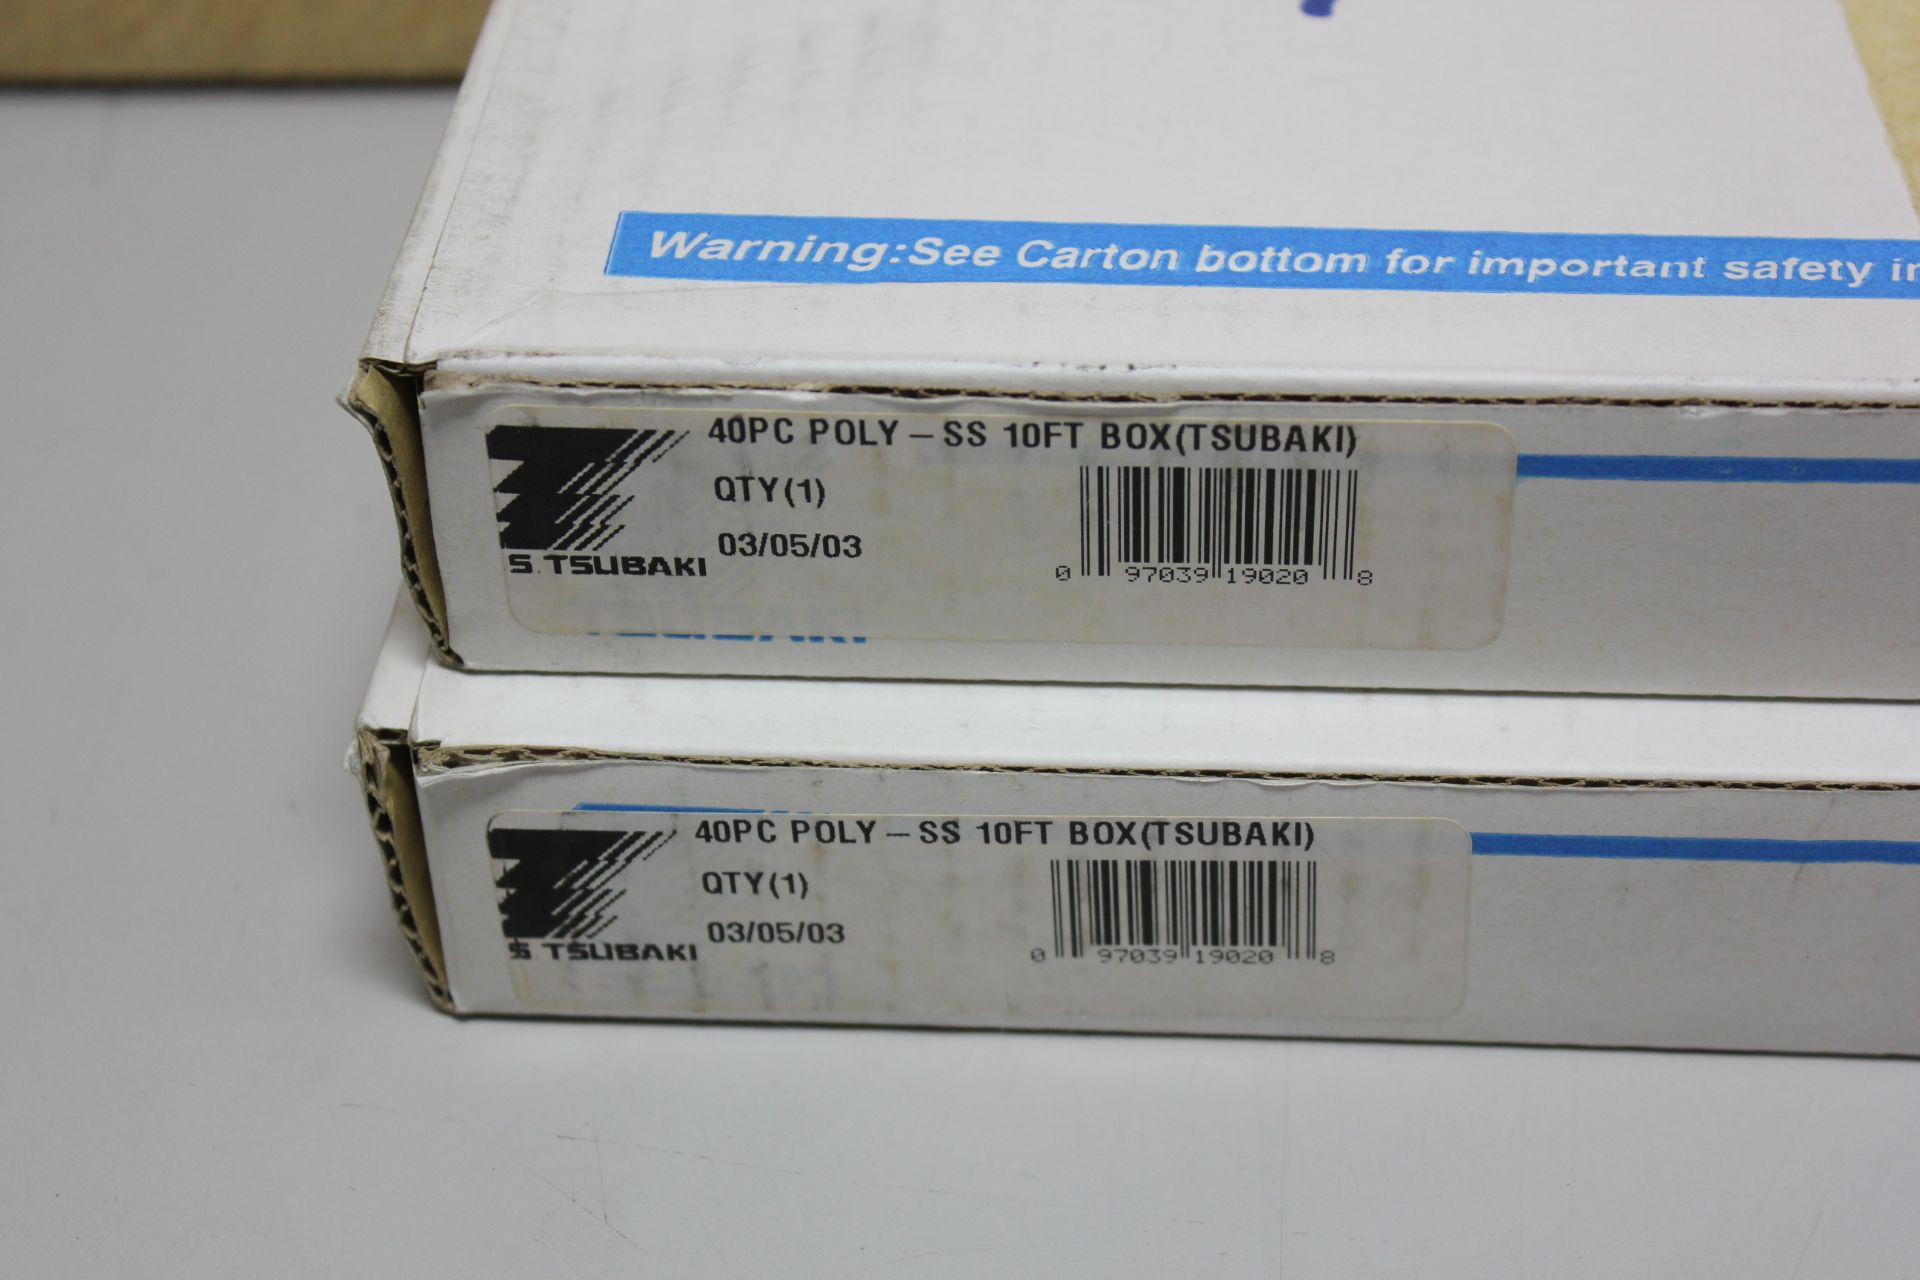 Lot 37 - 2 NEW BOXES OF TSUBAKI ROLLER CHAIN